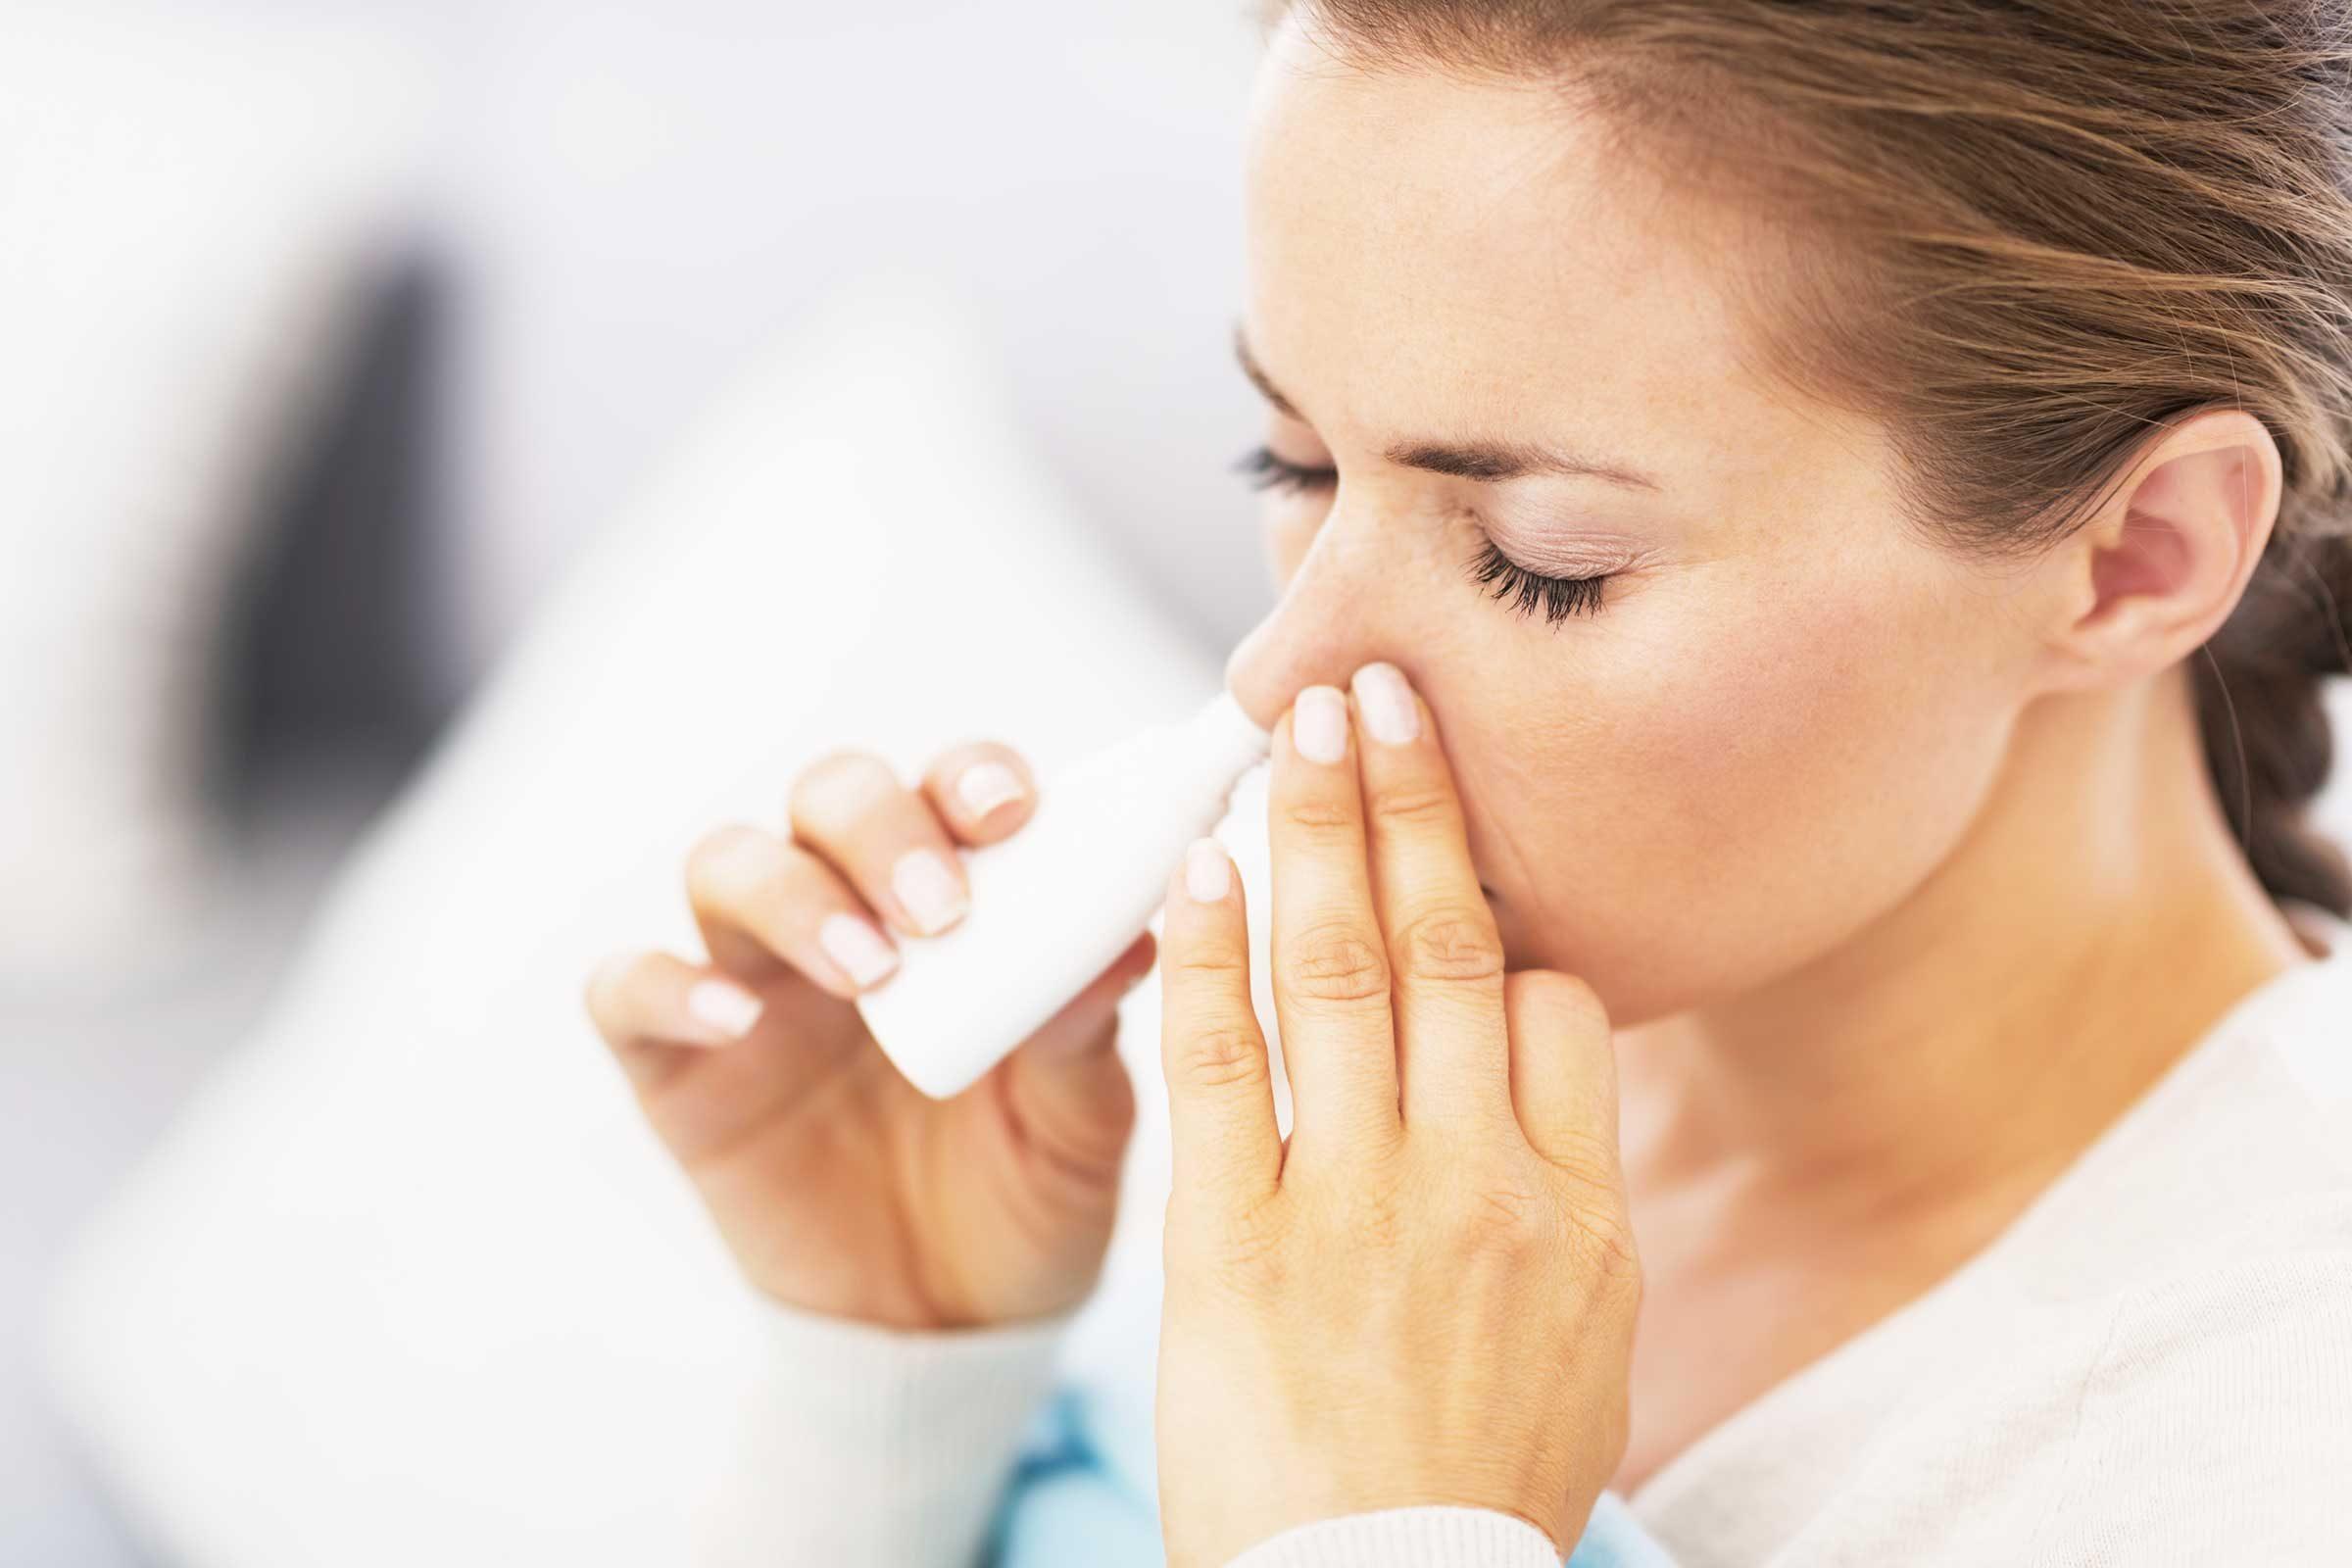 Otc Medication Mistakes Reader S Digest